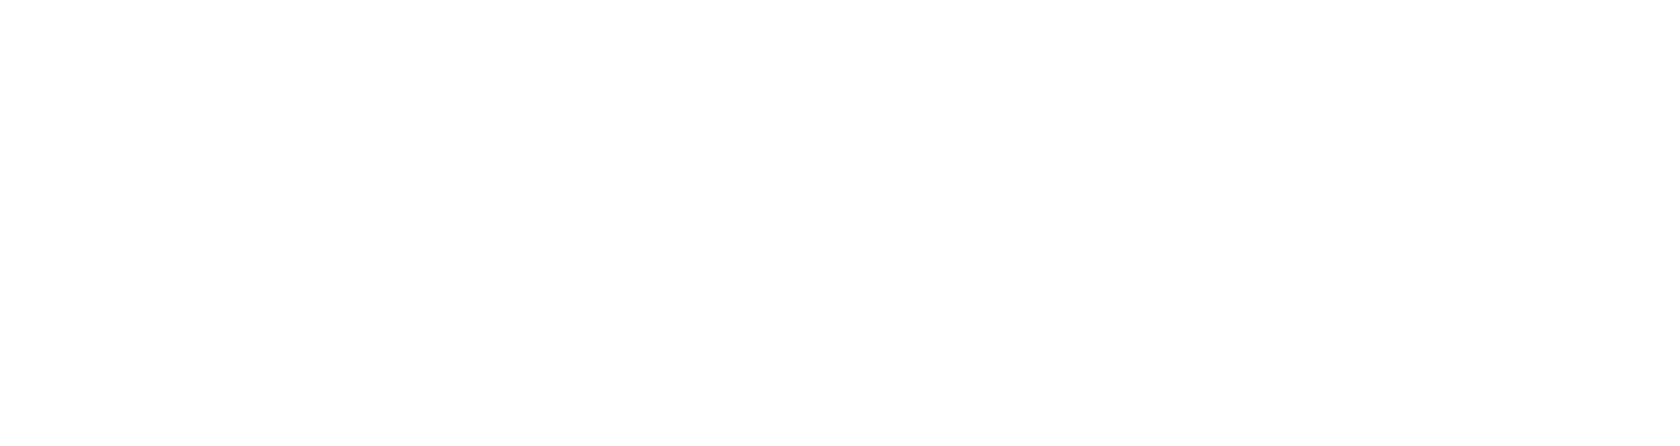 Repsfitnation